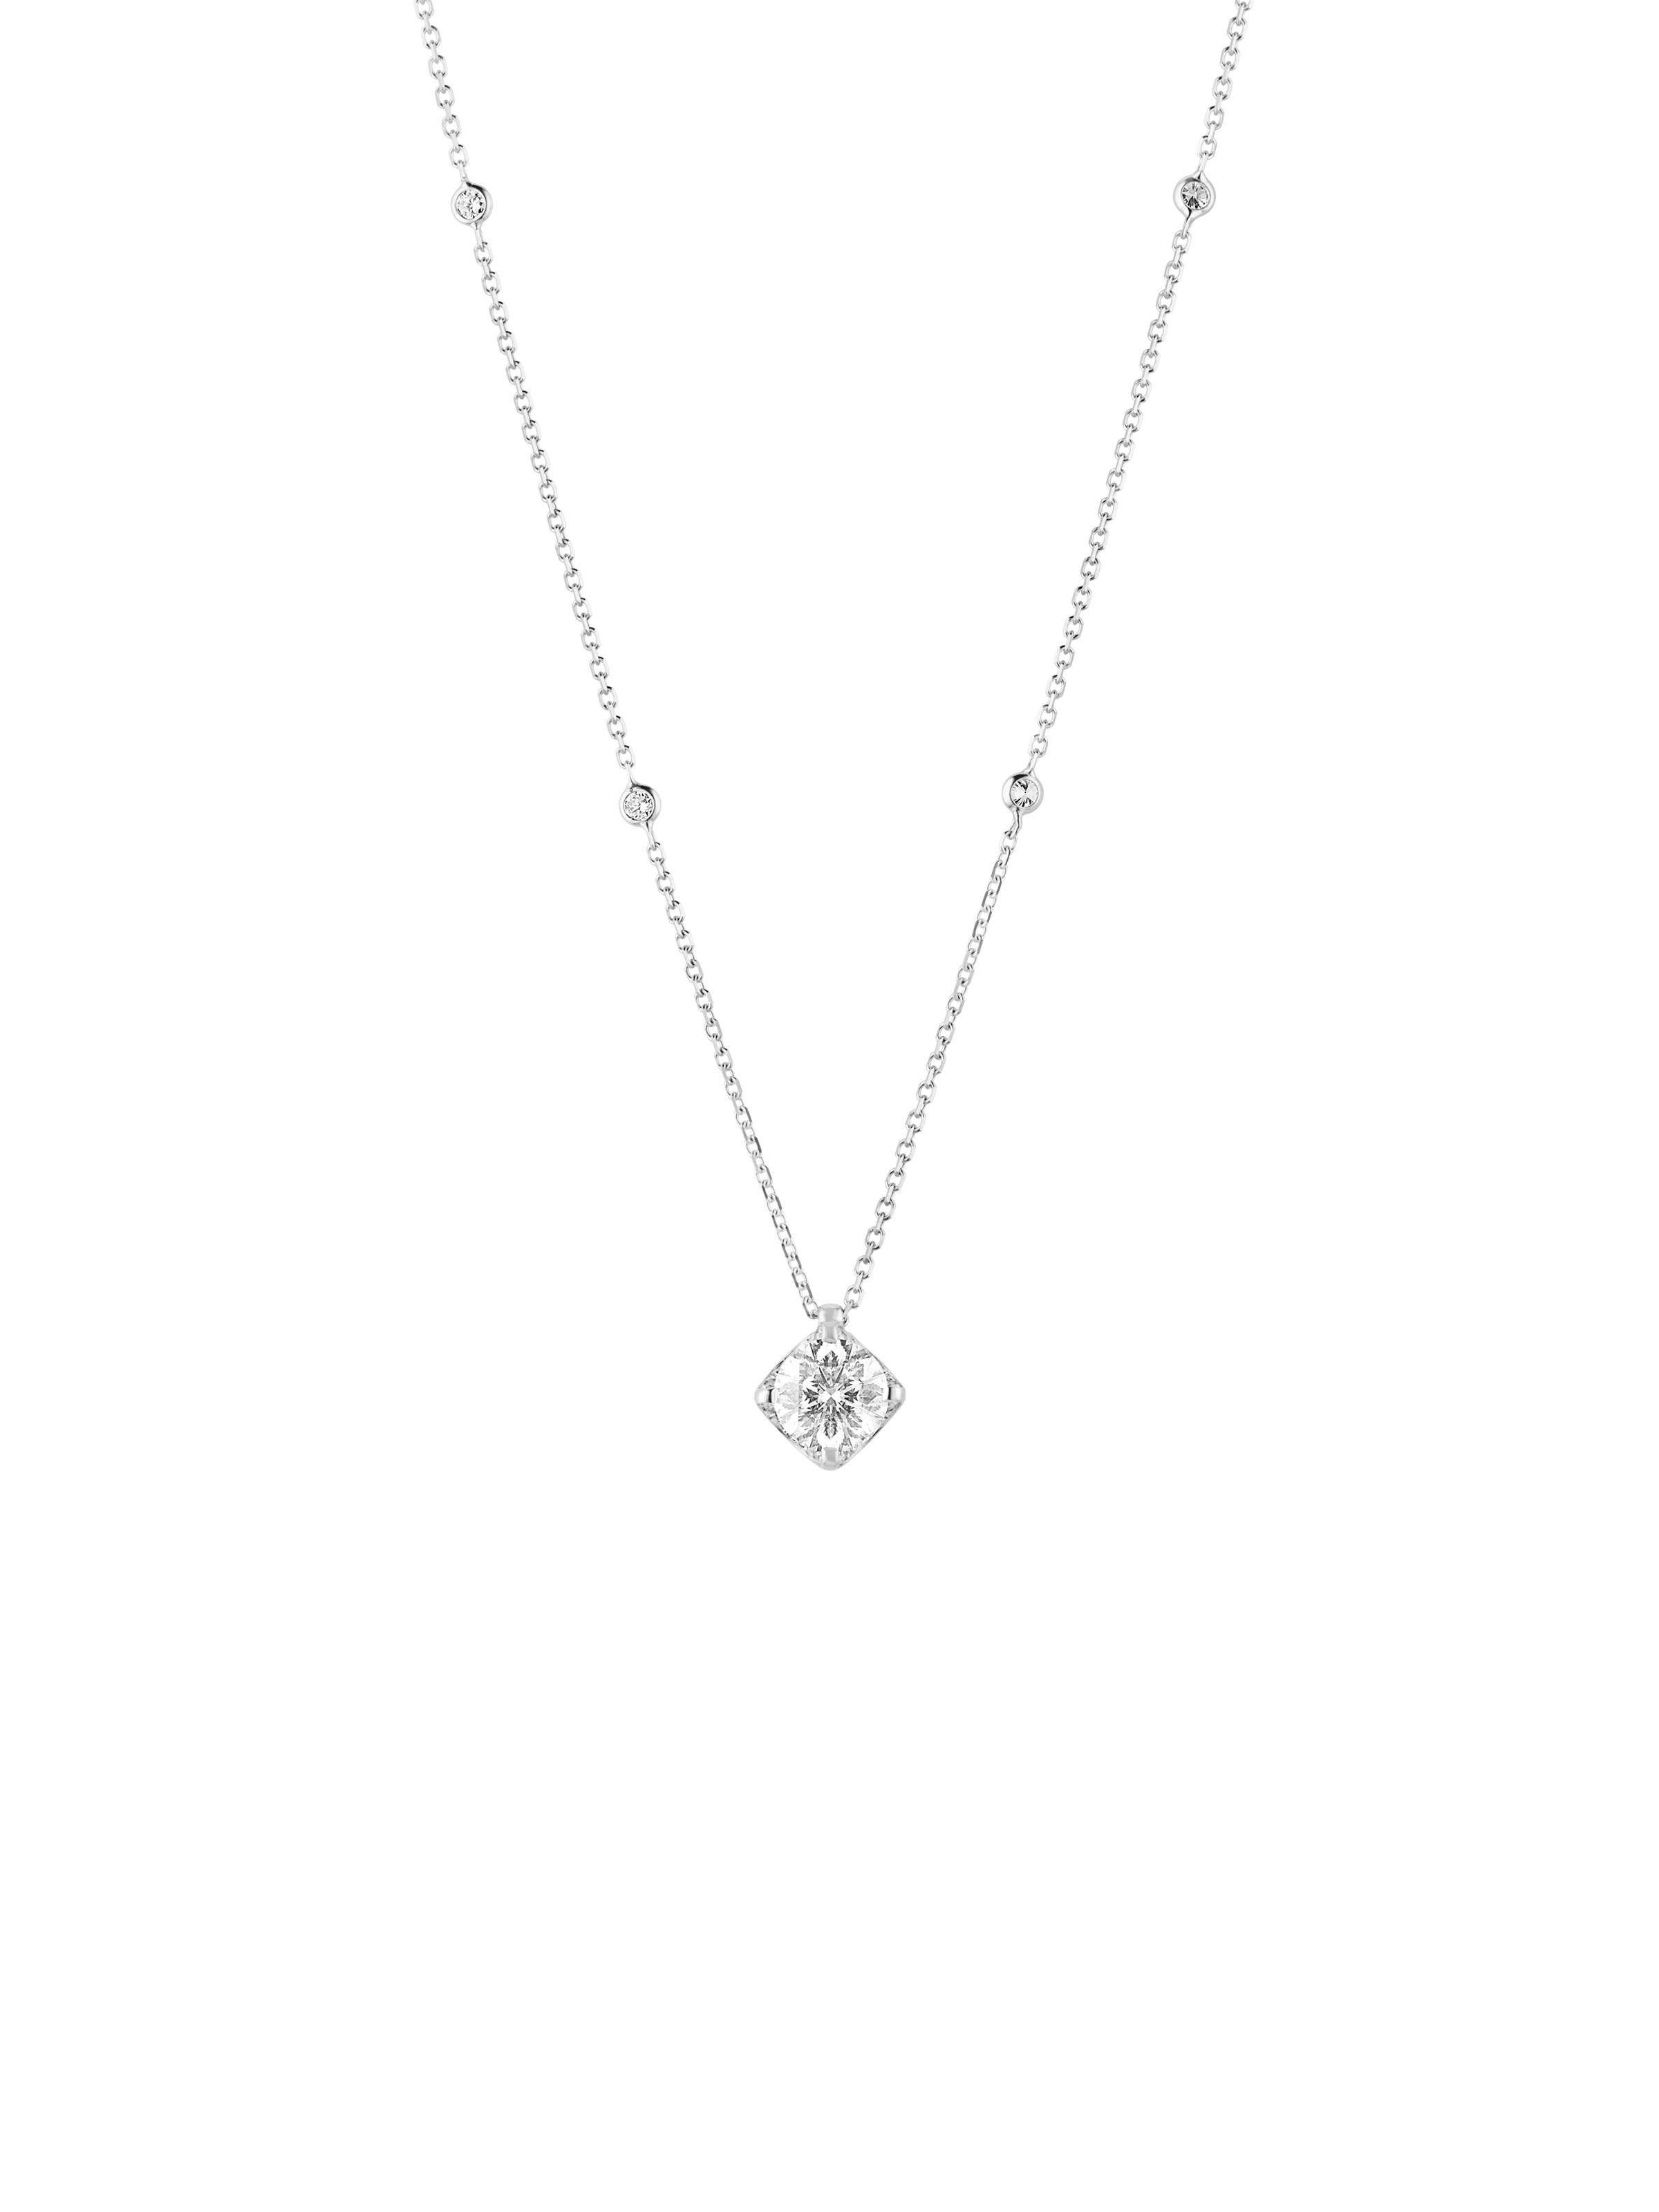 Splendora pendant